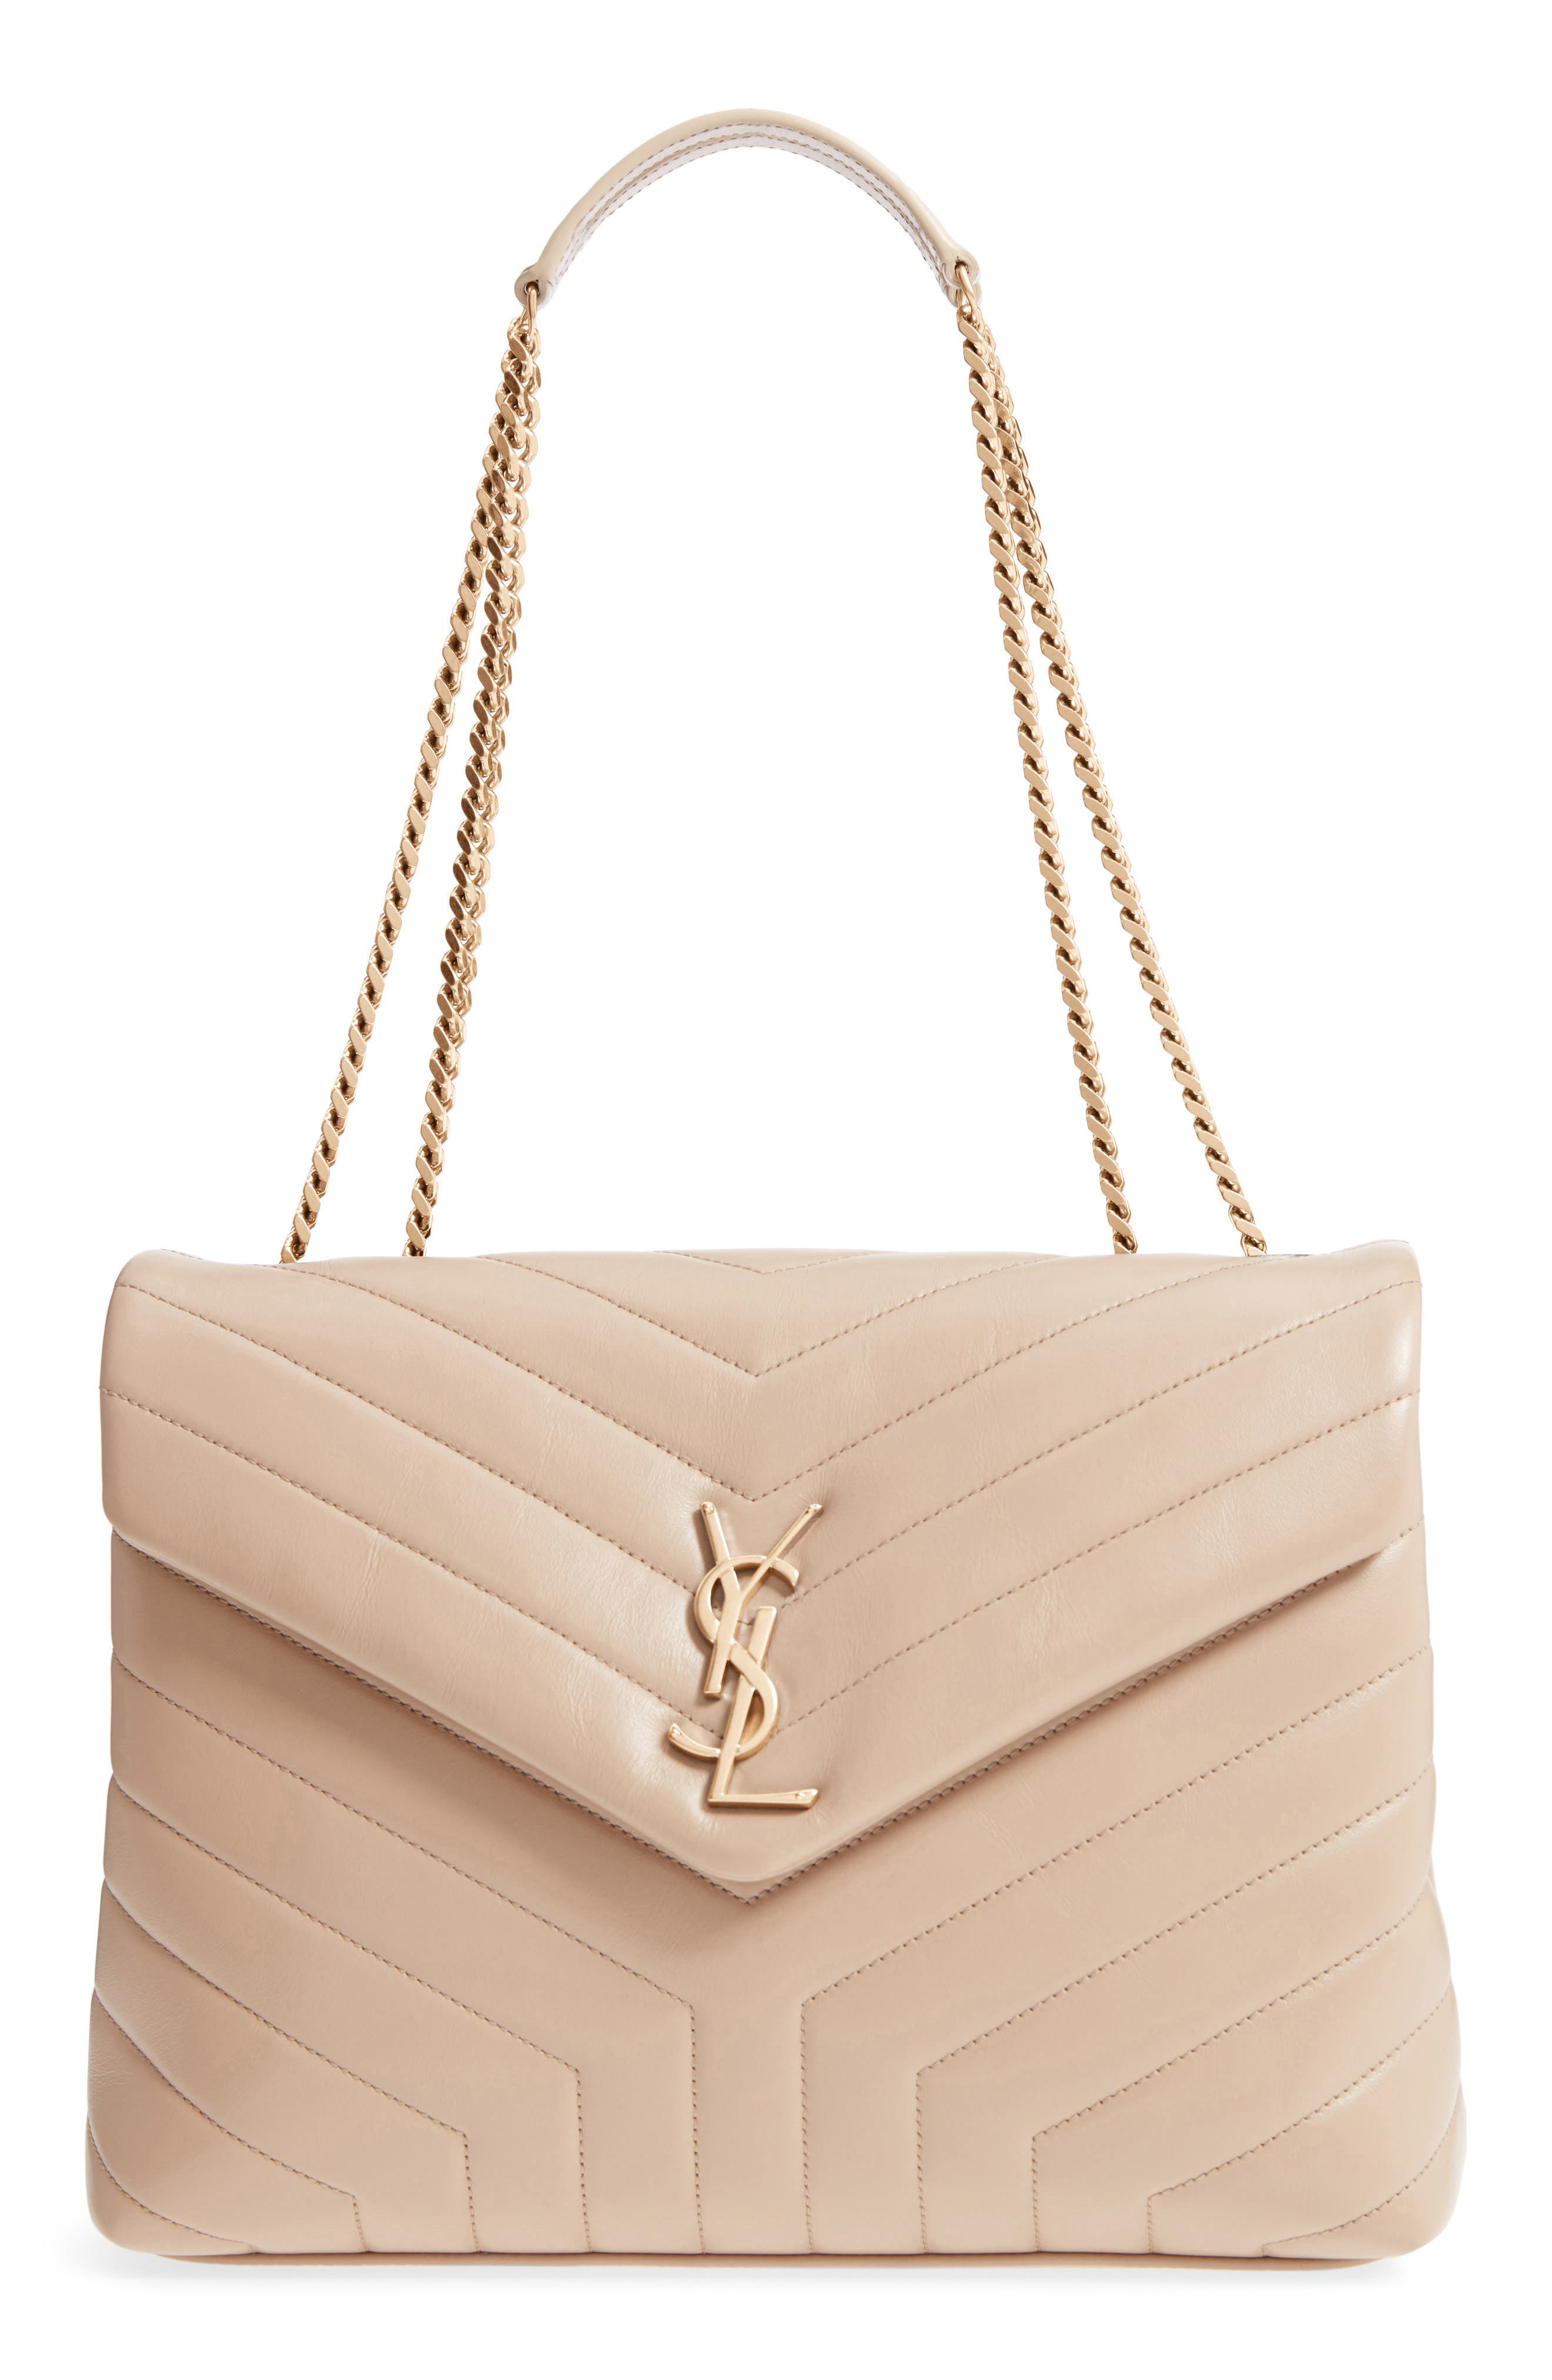 Medium Loulou Matelassé Calfskin Leather Shoulder Bag,                             Main thumbnail 1, color,                             LIGHT NATURAL